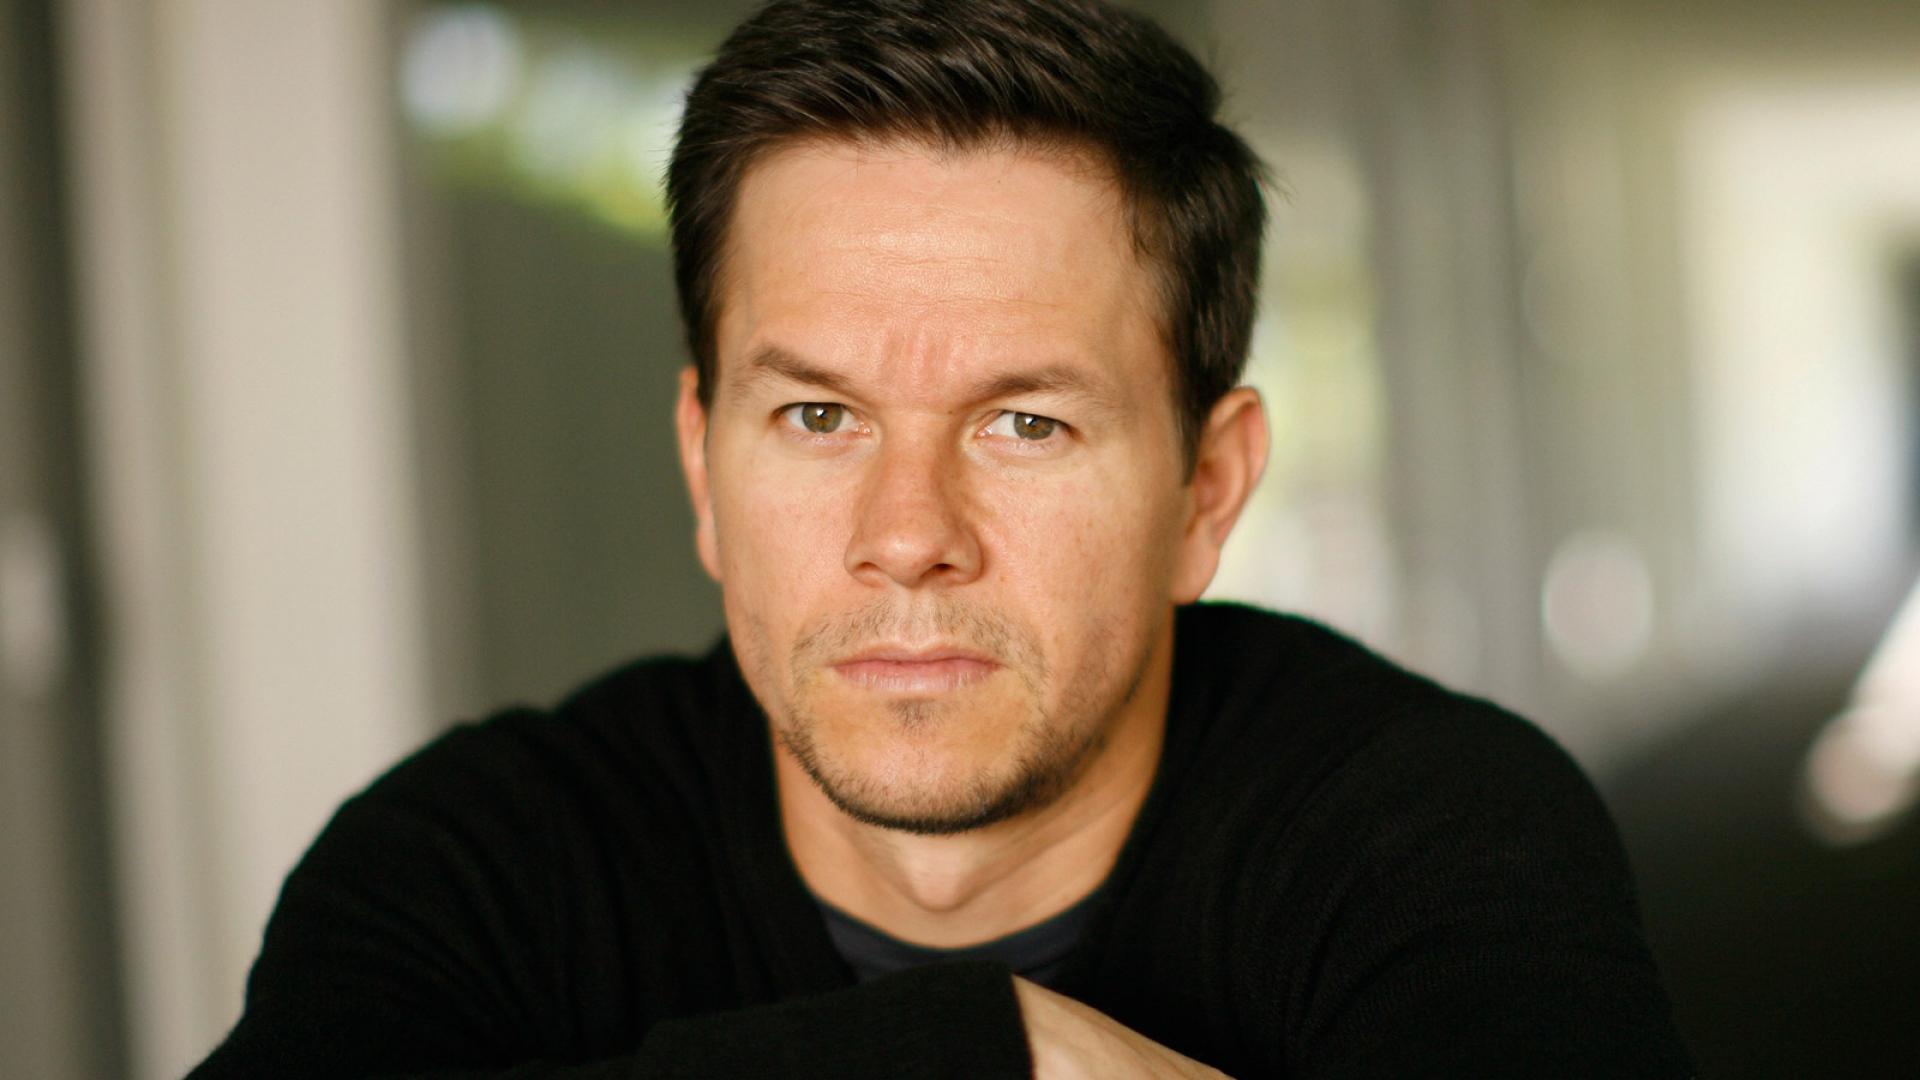 ... Mark Wahlberg; Mark Wahlberg